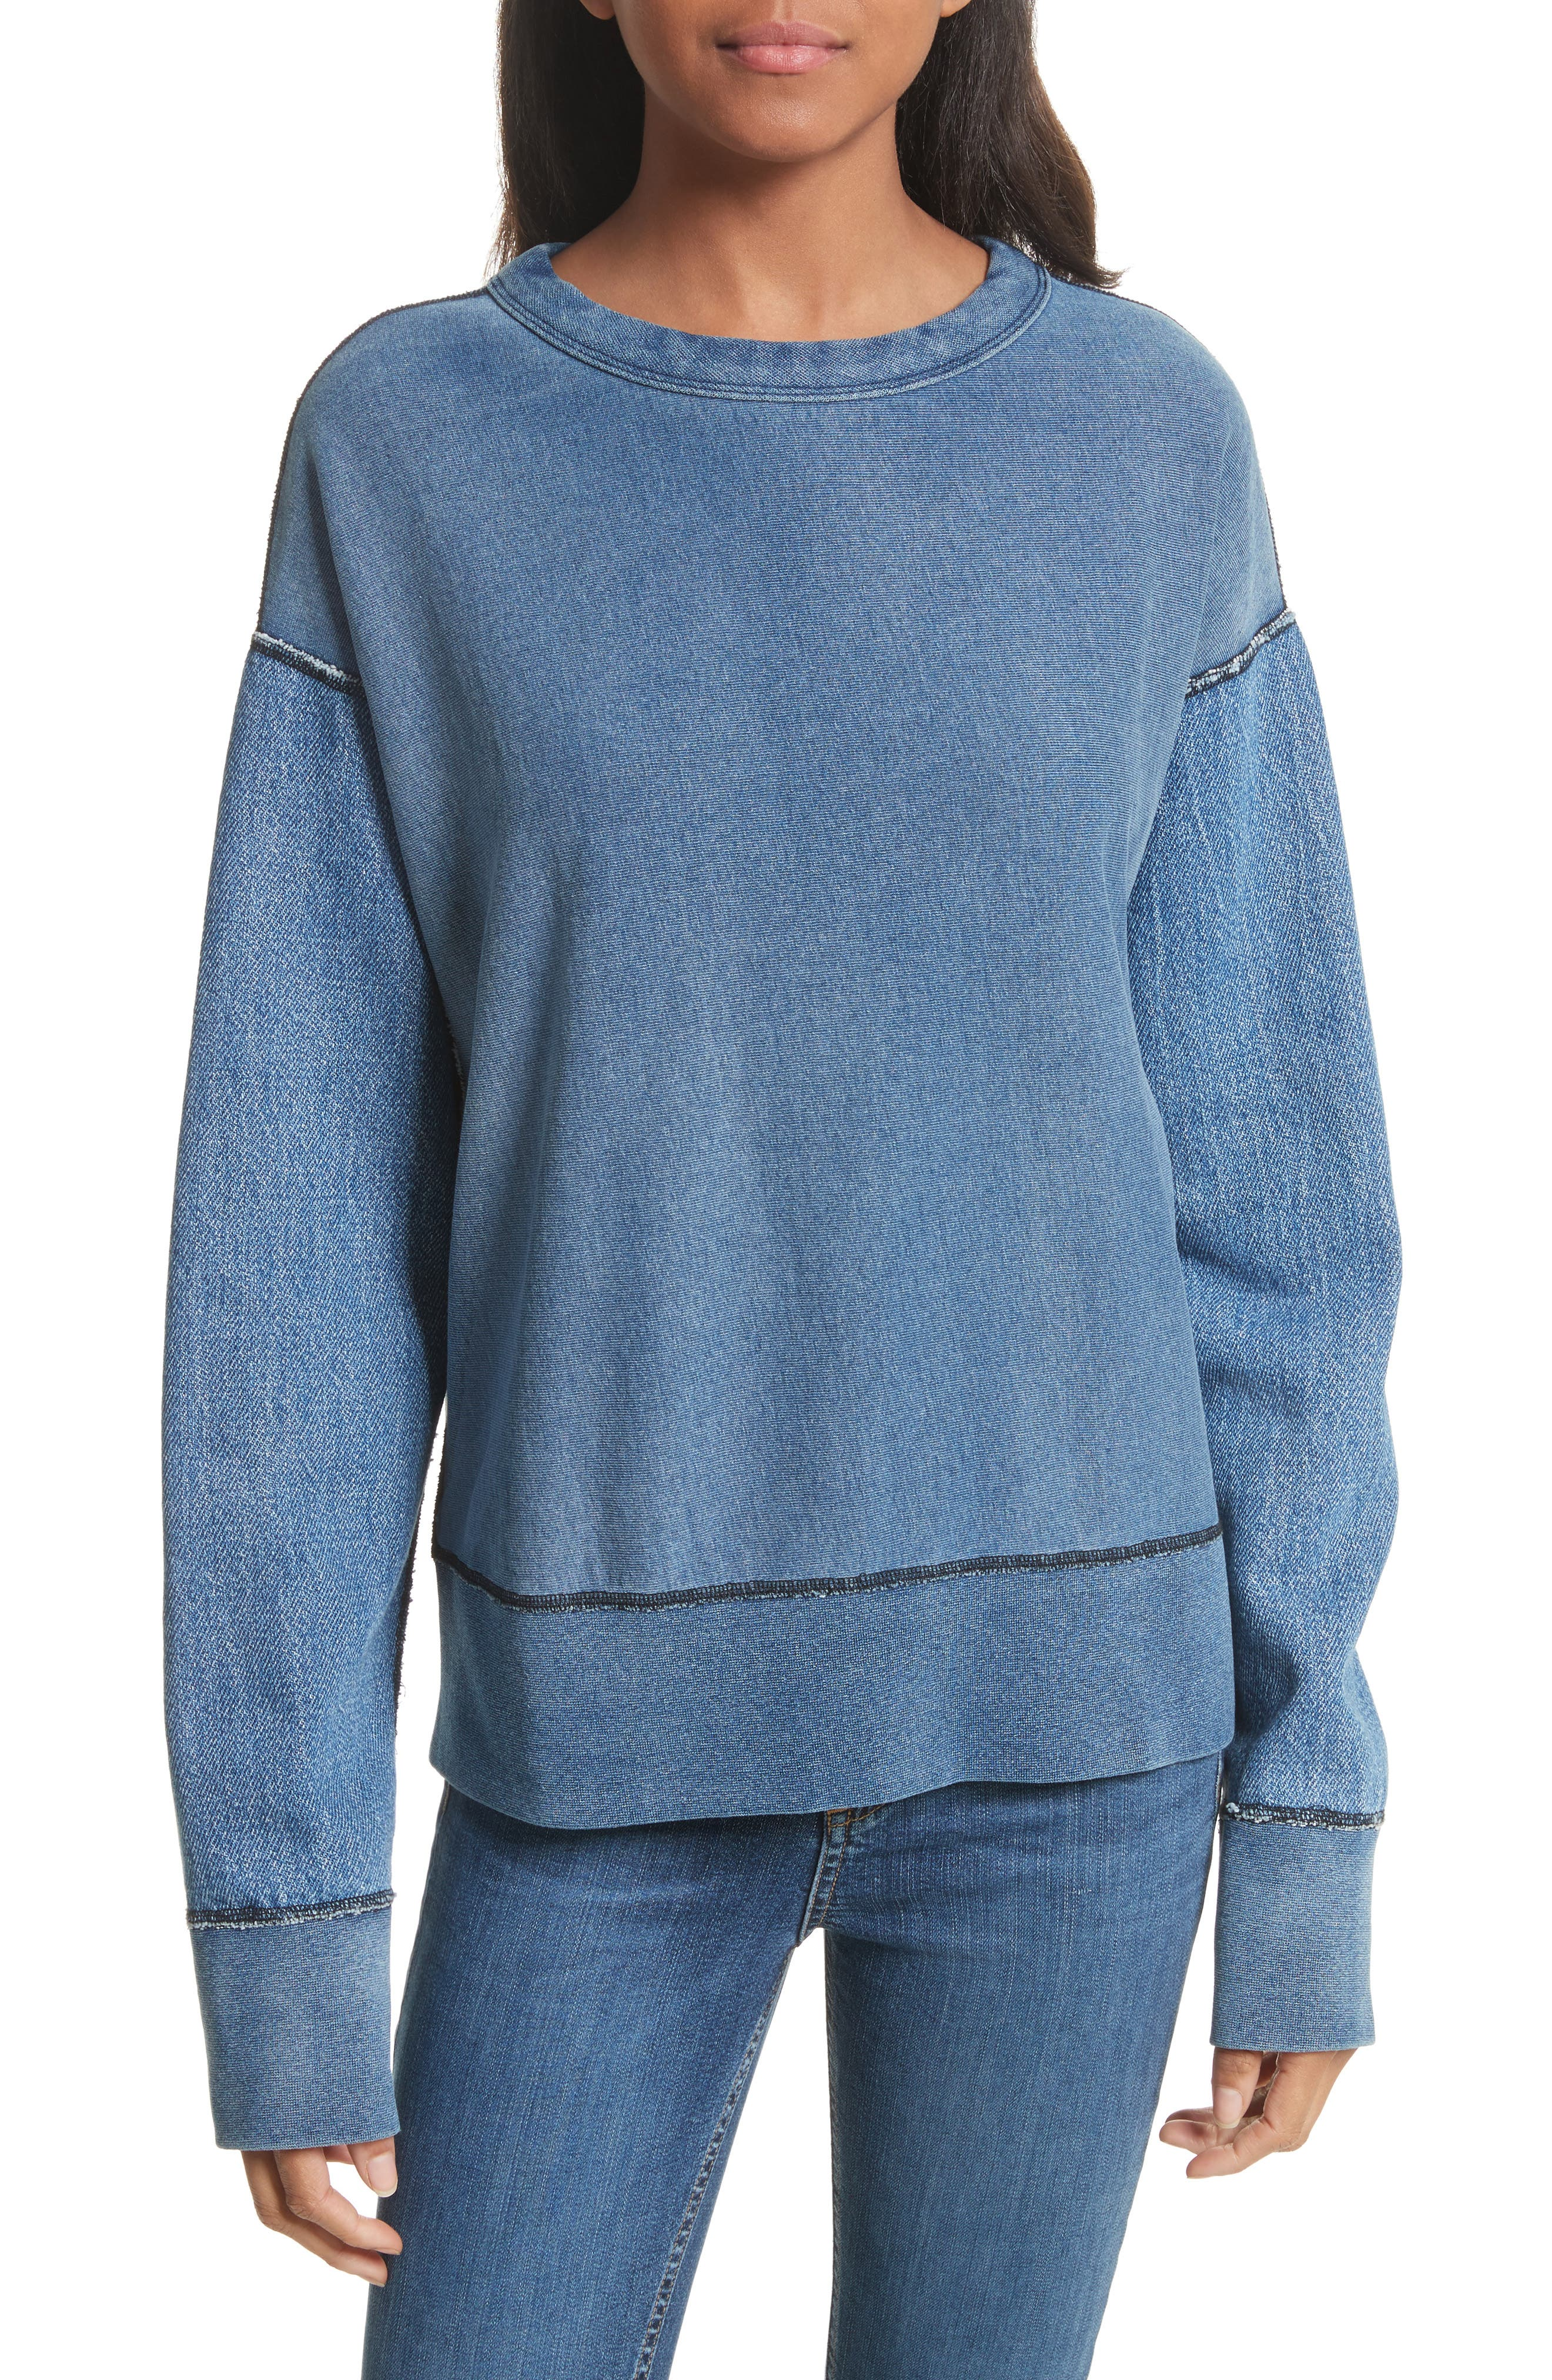 Main Image - rag & bone Indigo Baby Racer Sweatshirt